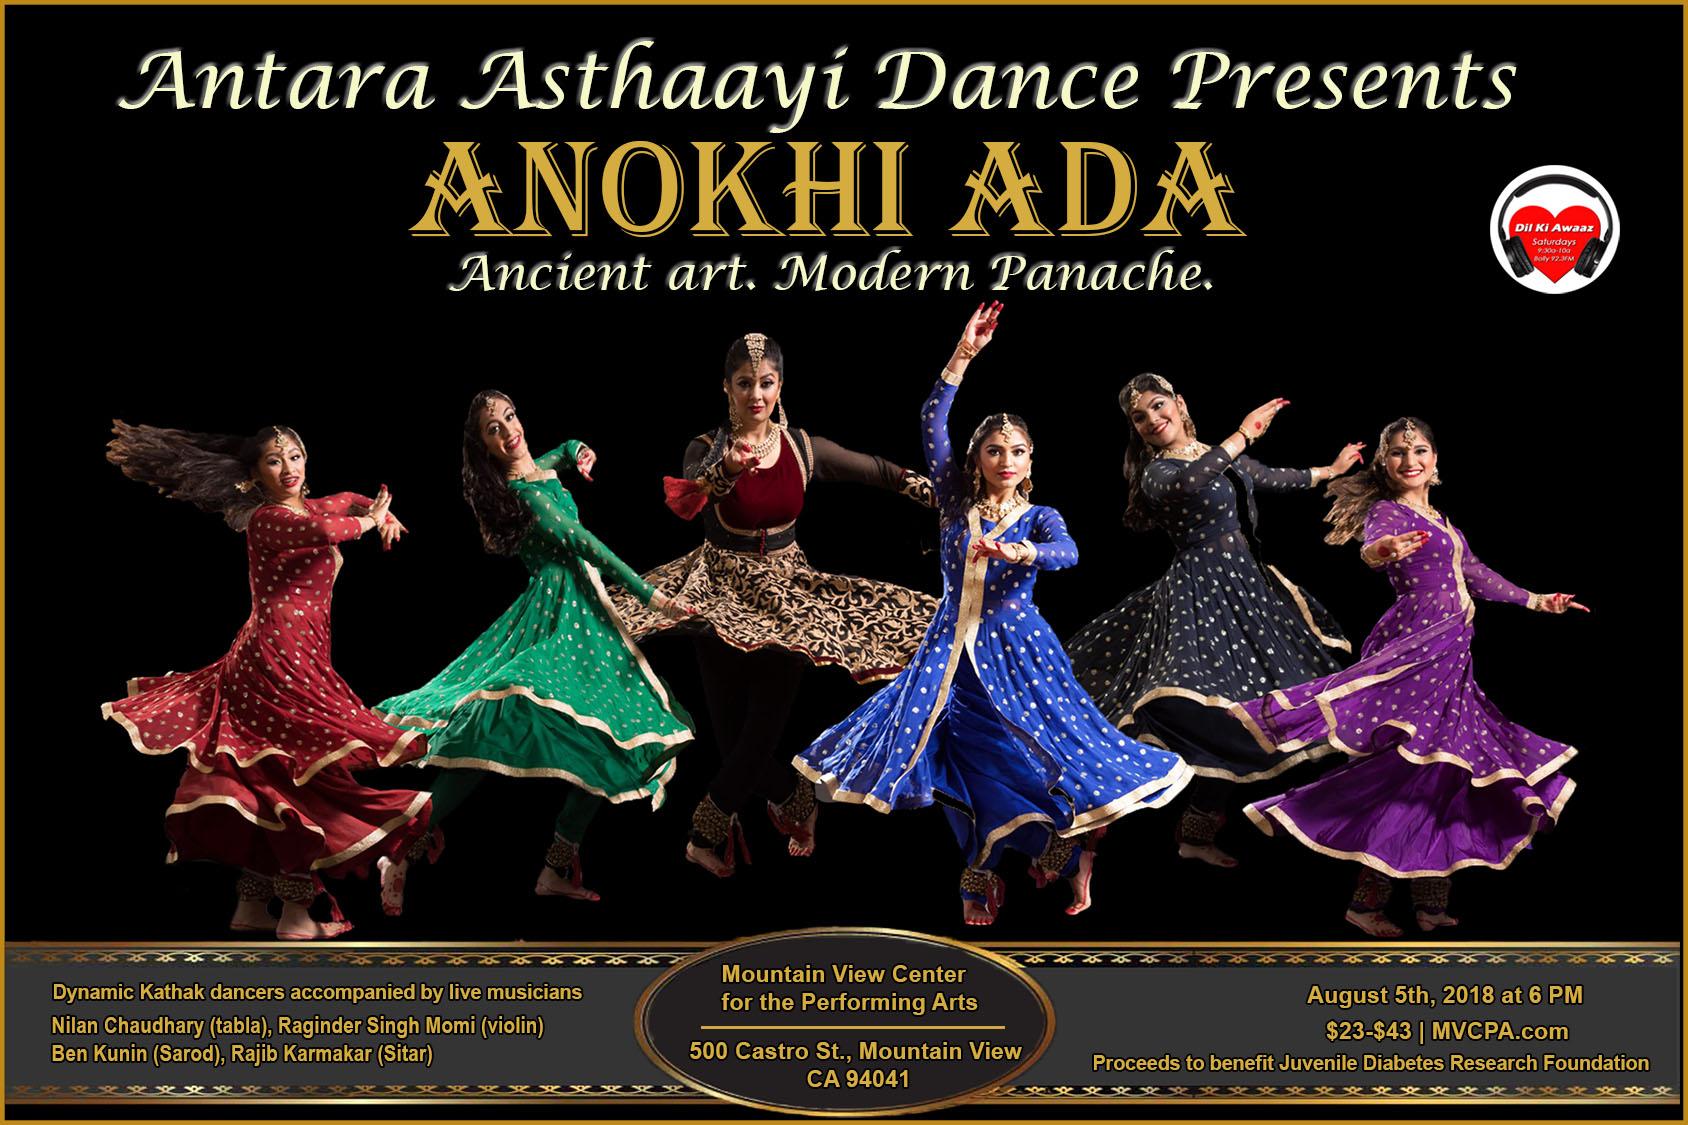 Anokhi Ada: Ancient Art, Modern Panache